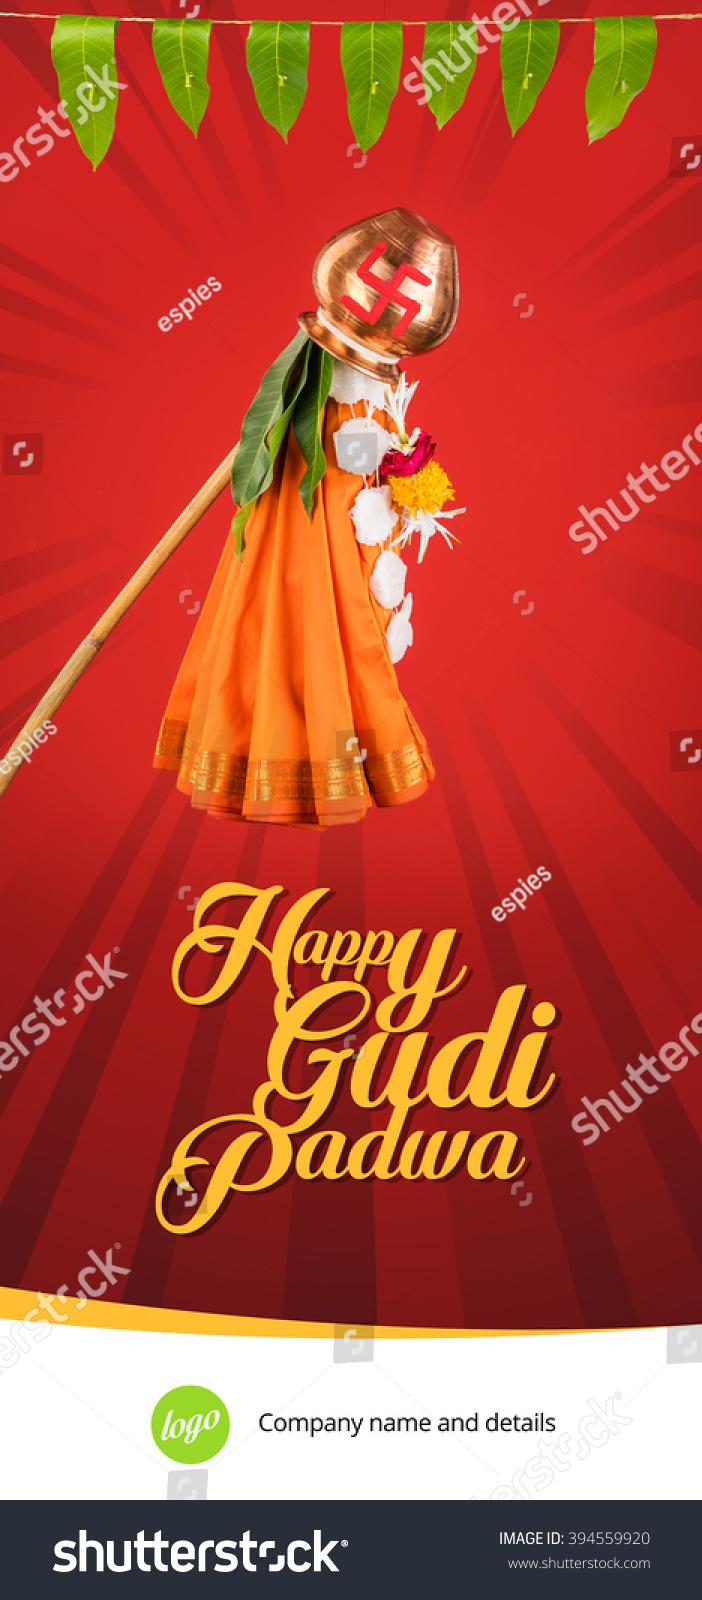 Royalty Free Happy Gudi Padwa Greeting Its A 394559920 Stock